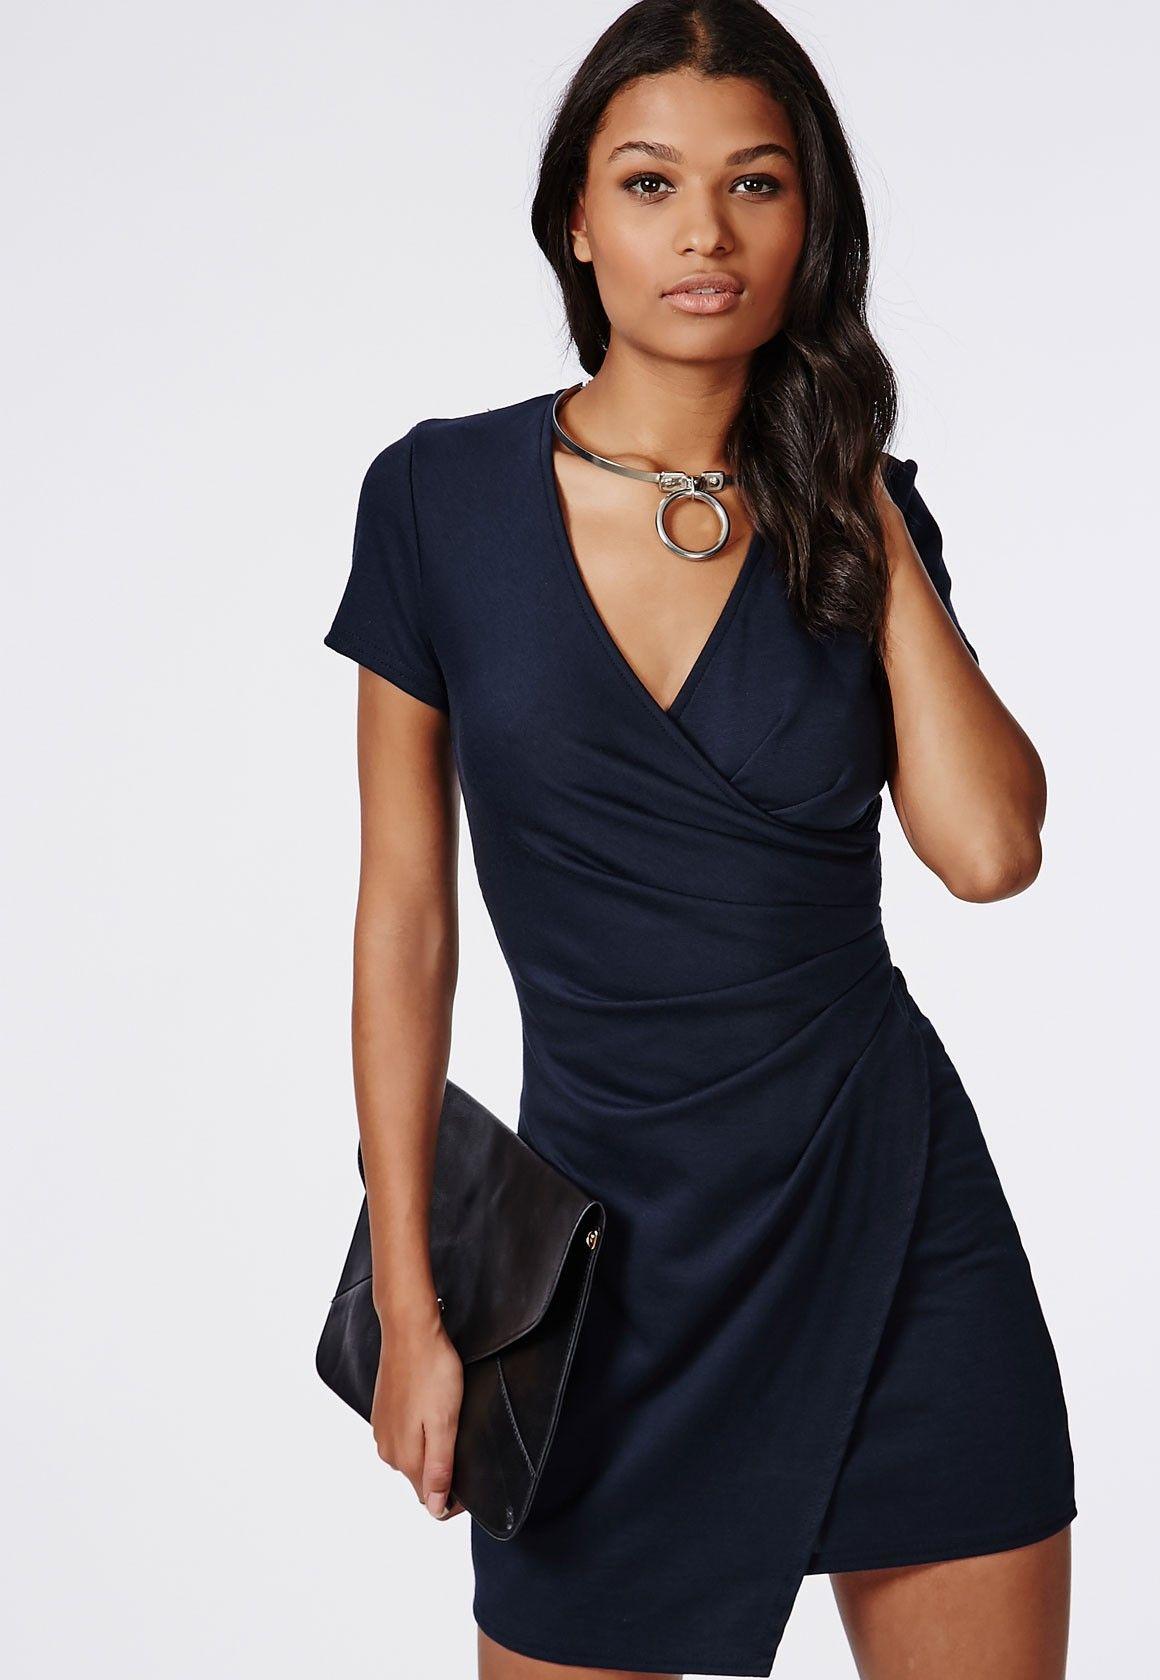 Missguided - Jennie Short Sleeve Wrap Bodycon Dress Navy  f21482e85